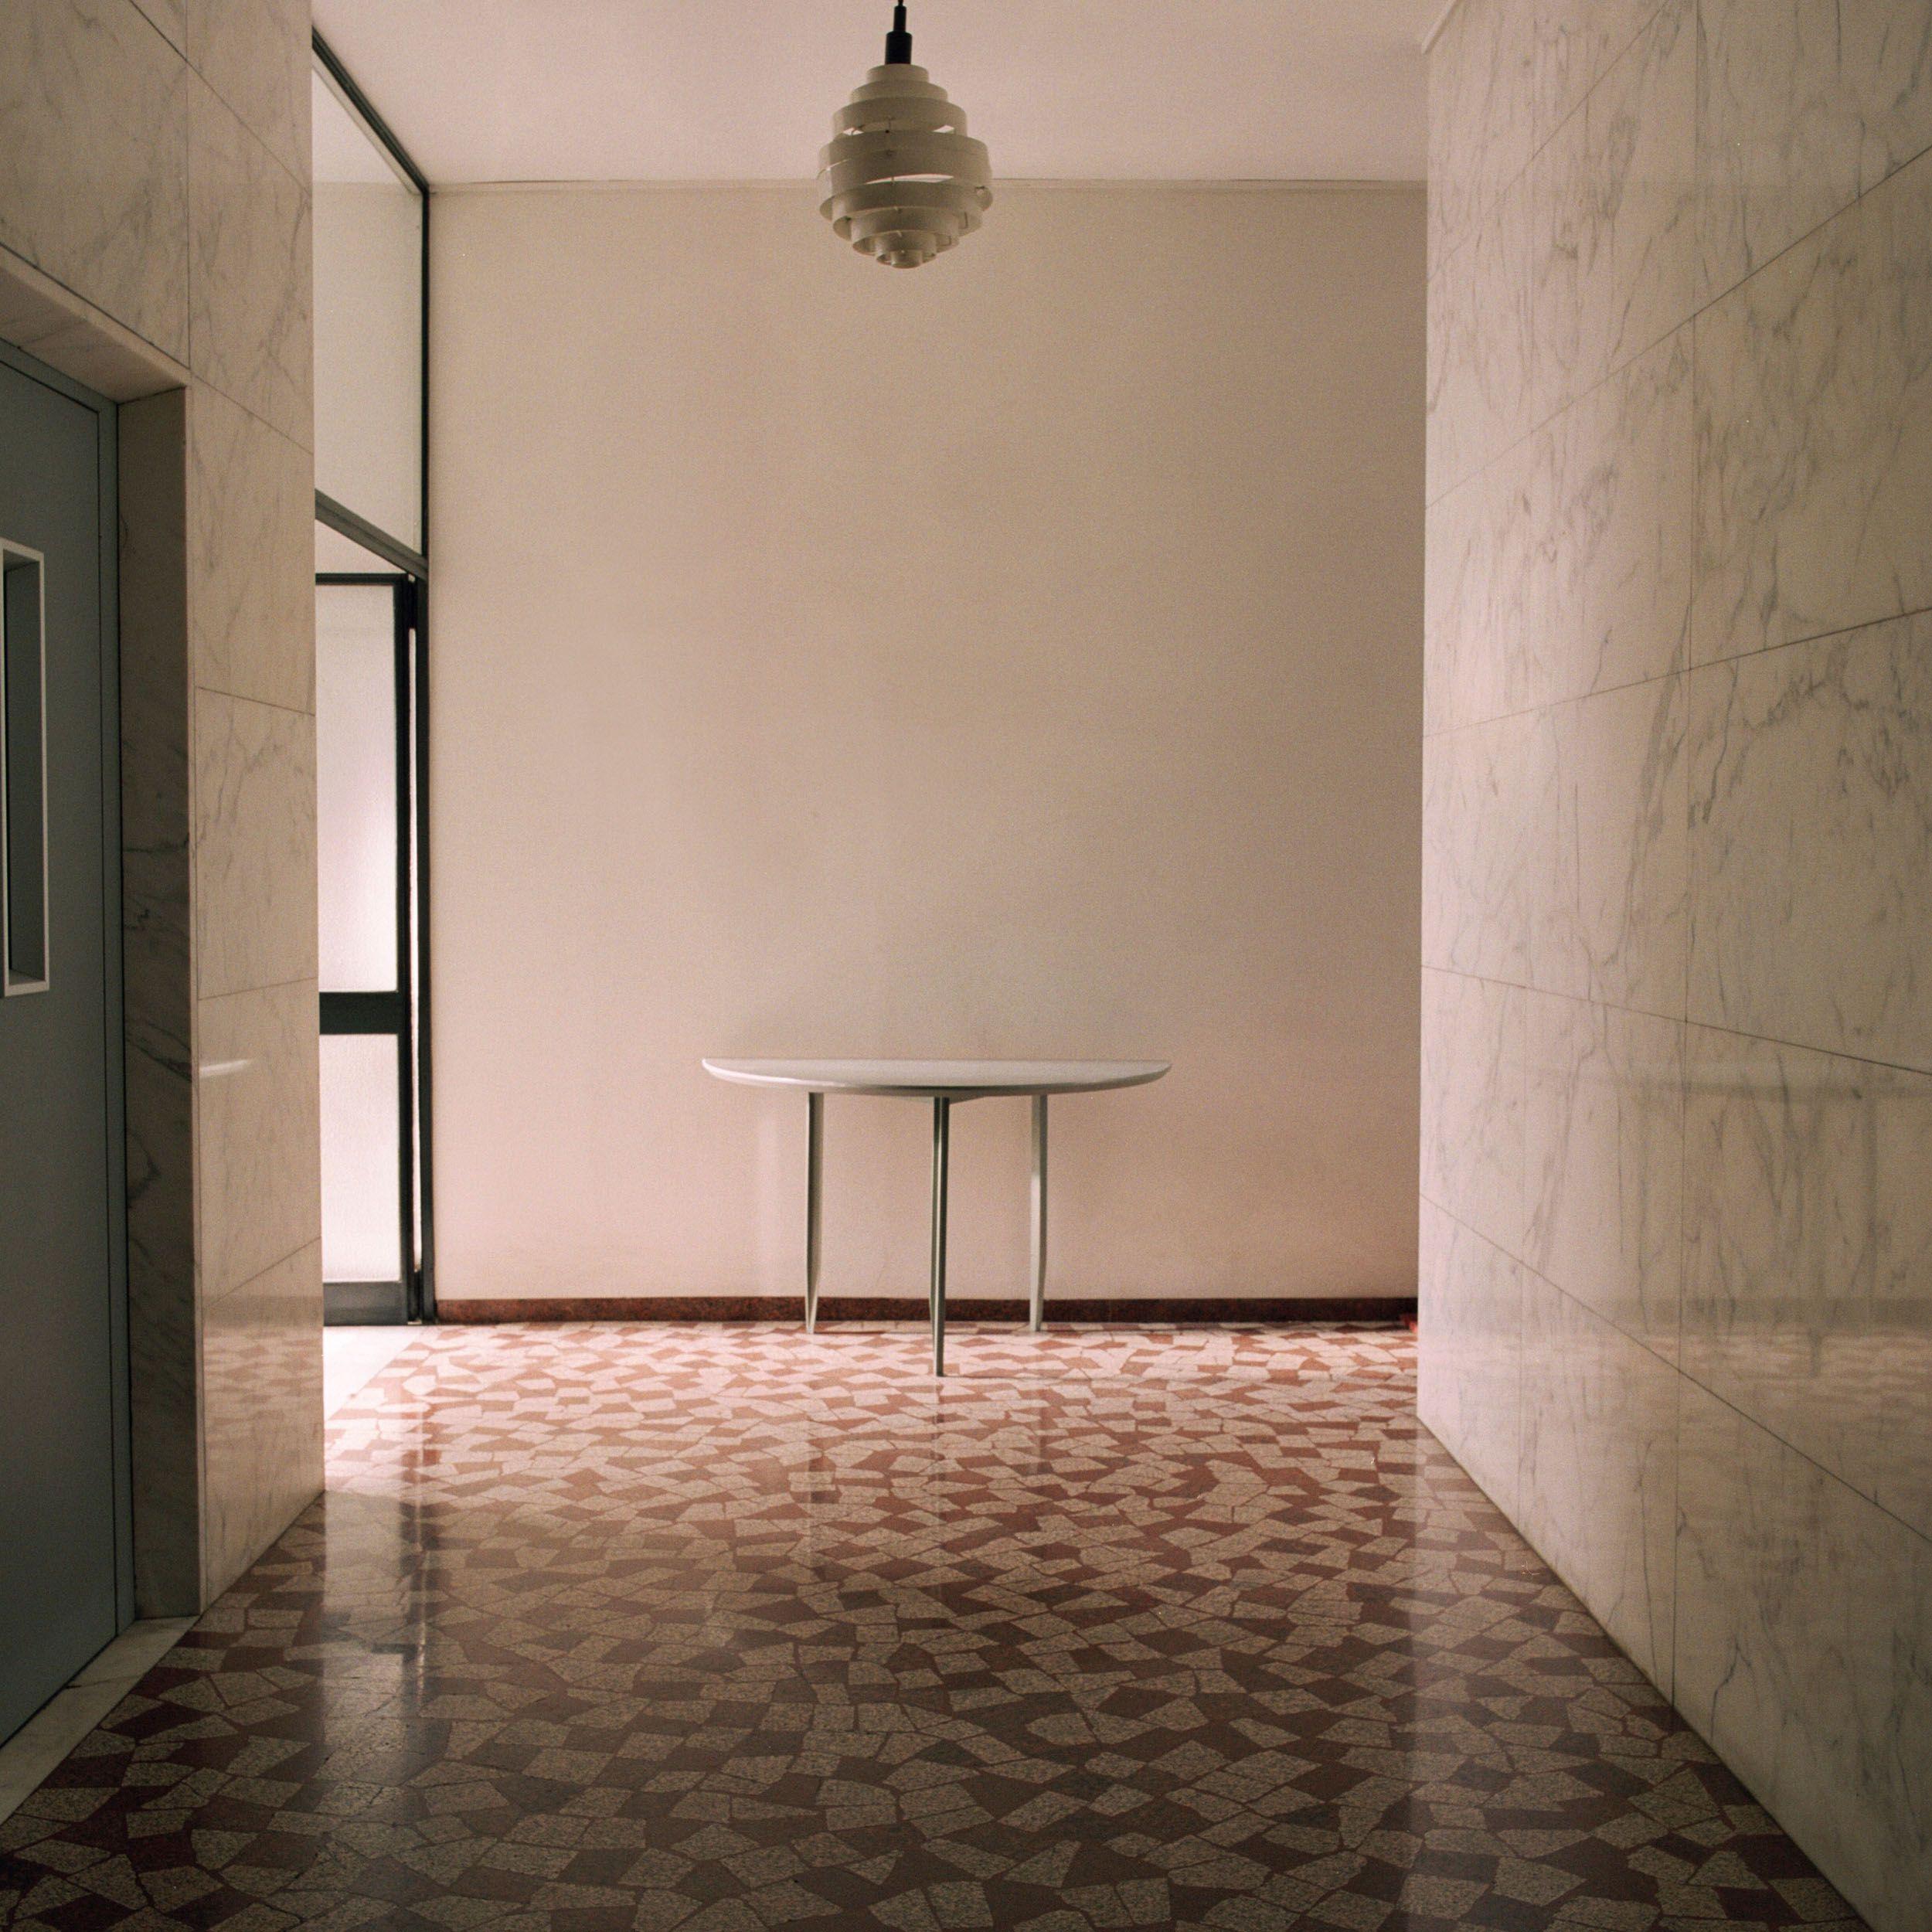 Sillabe Luca Baroni Furniture Table 10